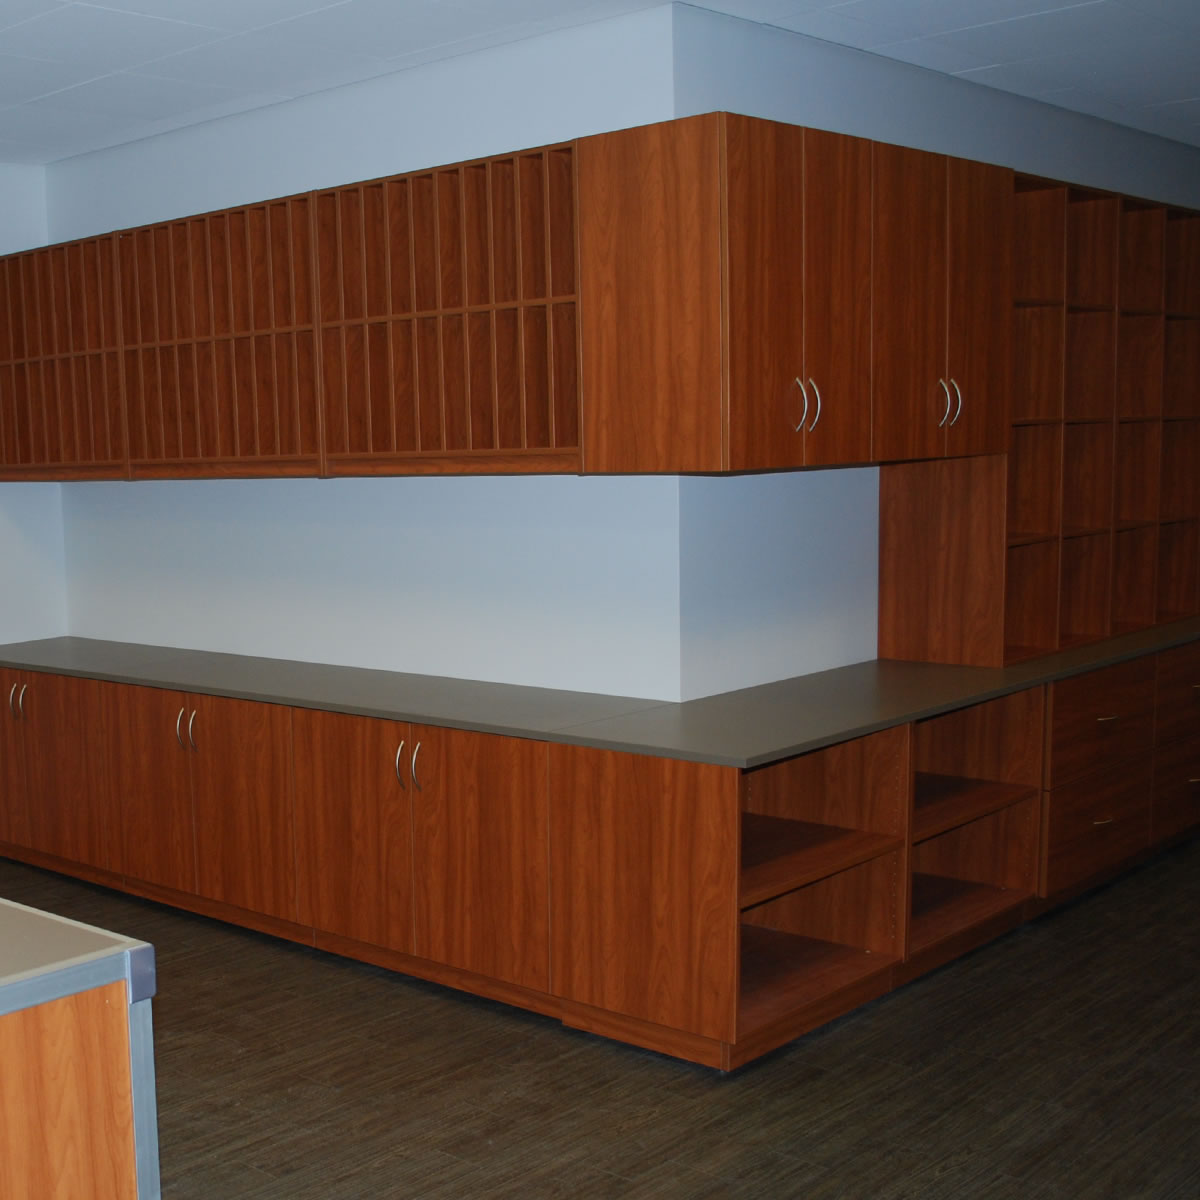 Modular Wall Cabinet Systems Interior Design Living Room